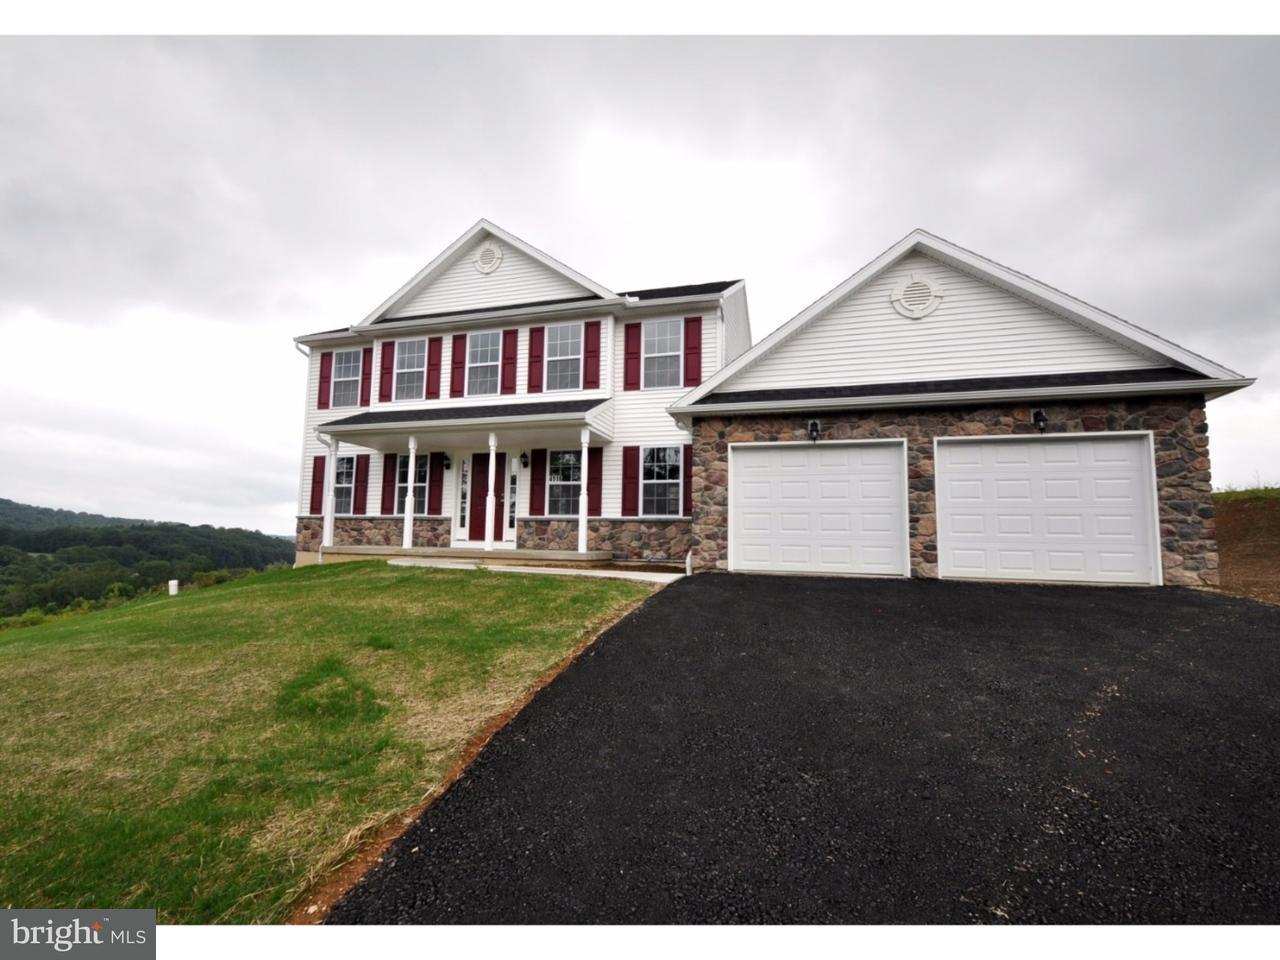 Single Family Home for Sale at 4916 COATBRIDGE Lane Walnutport, Pennsylvania 18088 United States